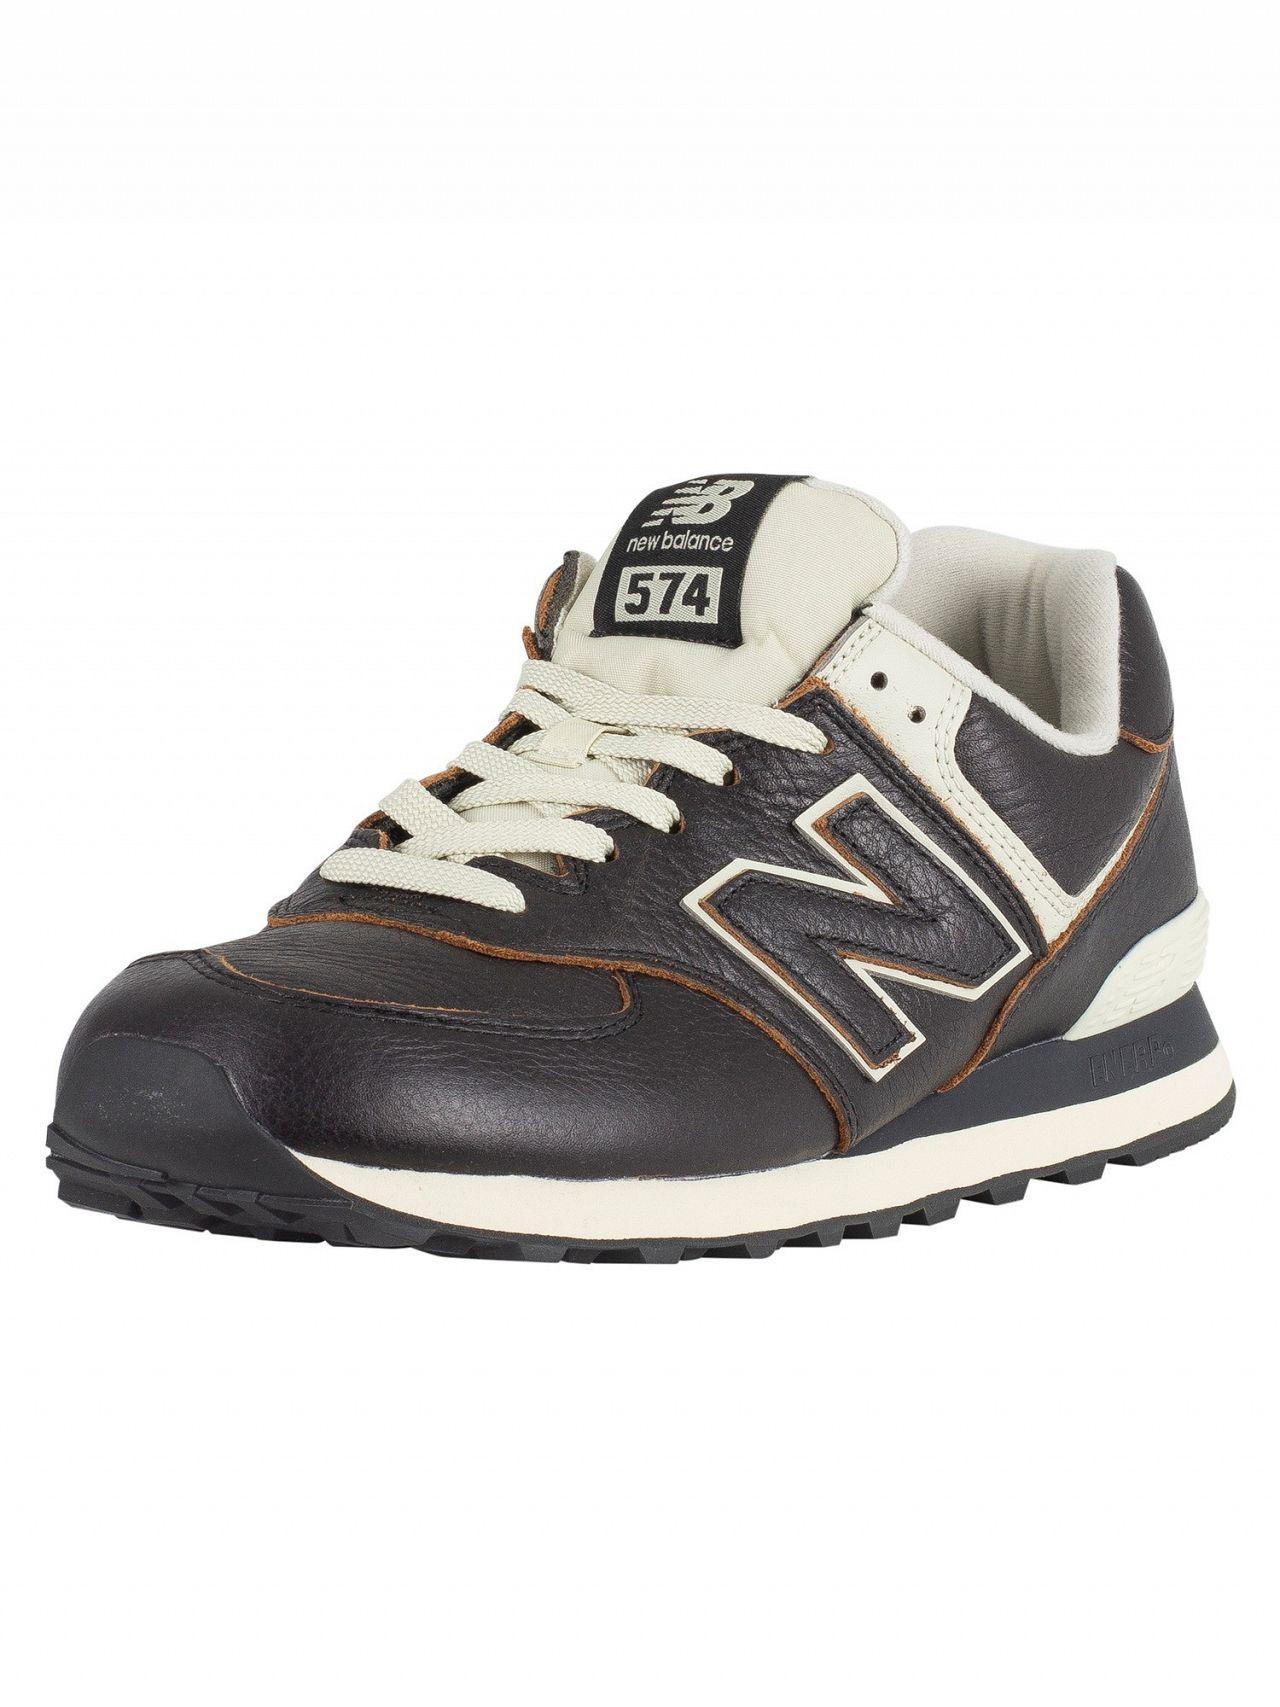 7a435b25c62 New Balance Black/White Munsell 574 Leather Trainers